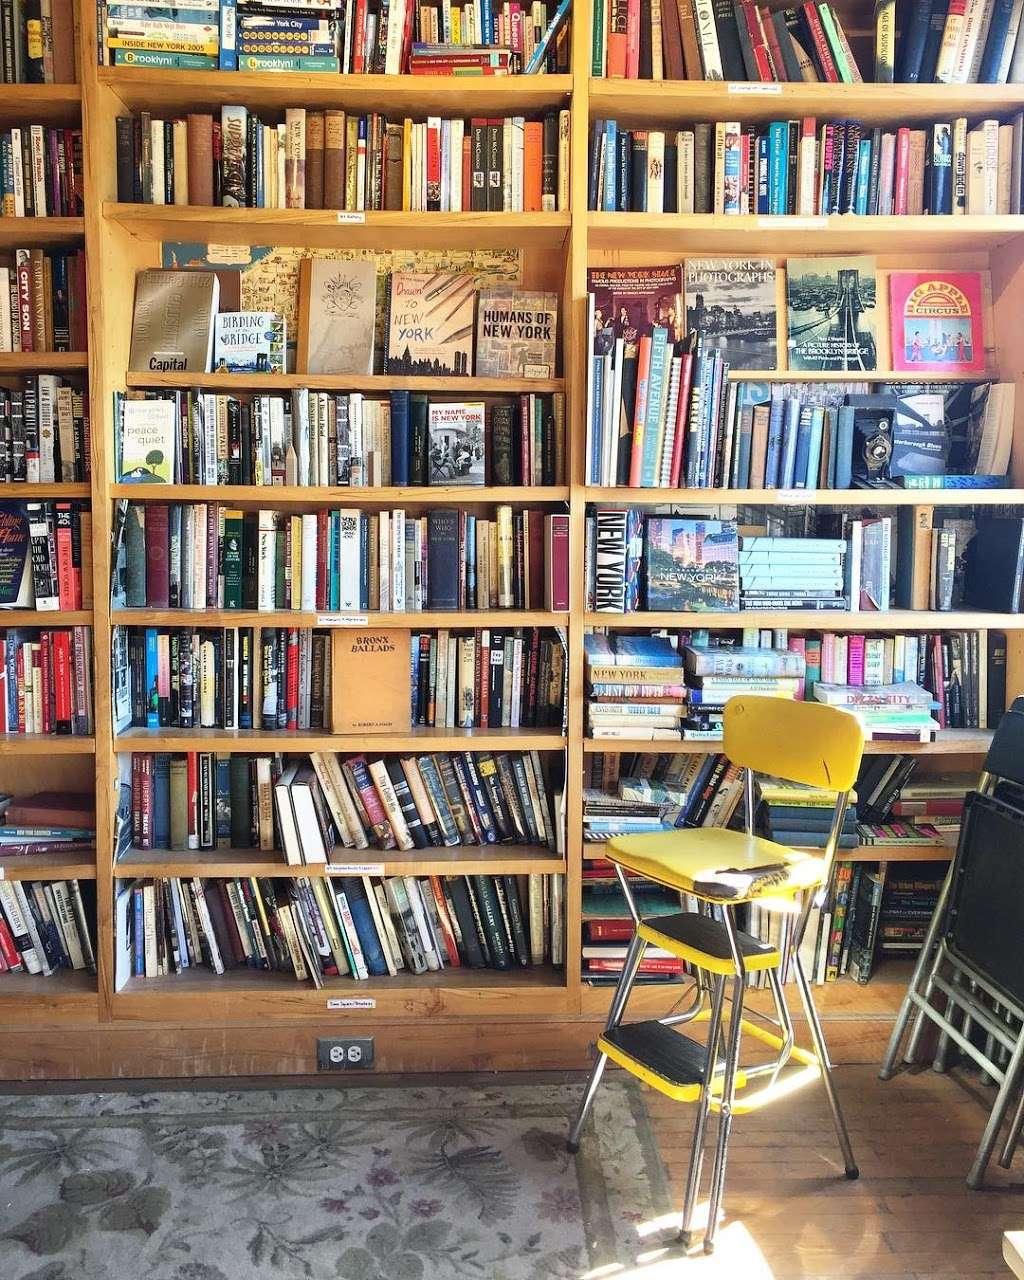 Freebird Books & Goods - book store  | Photo 1 of 5 | Address: 123 Columbia St, Brooklyn, NY 11231, USA | Phone: (718) 643-8484